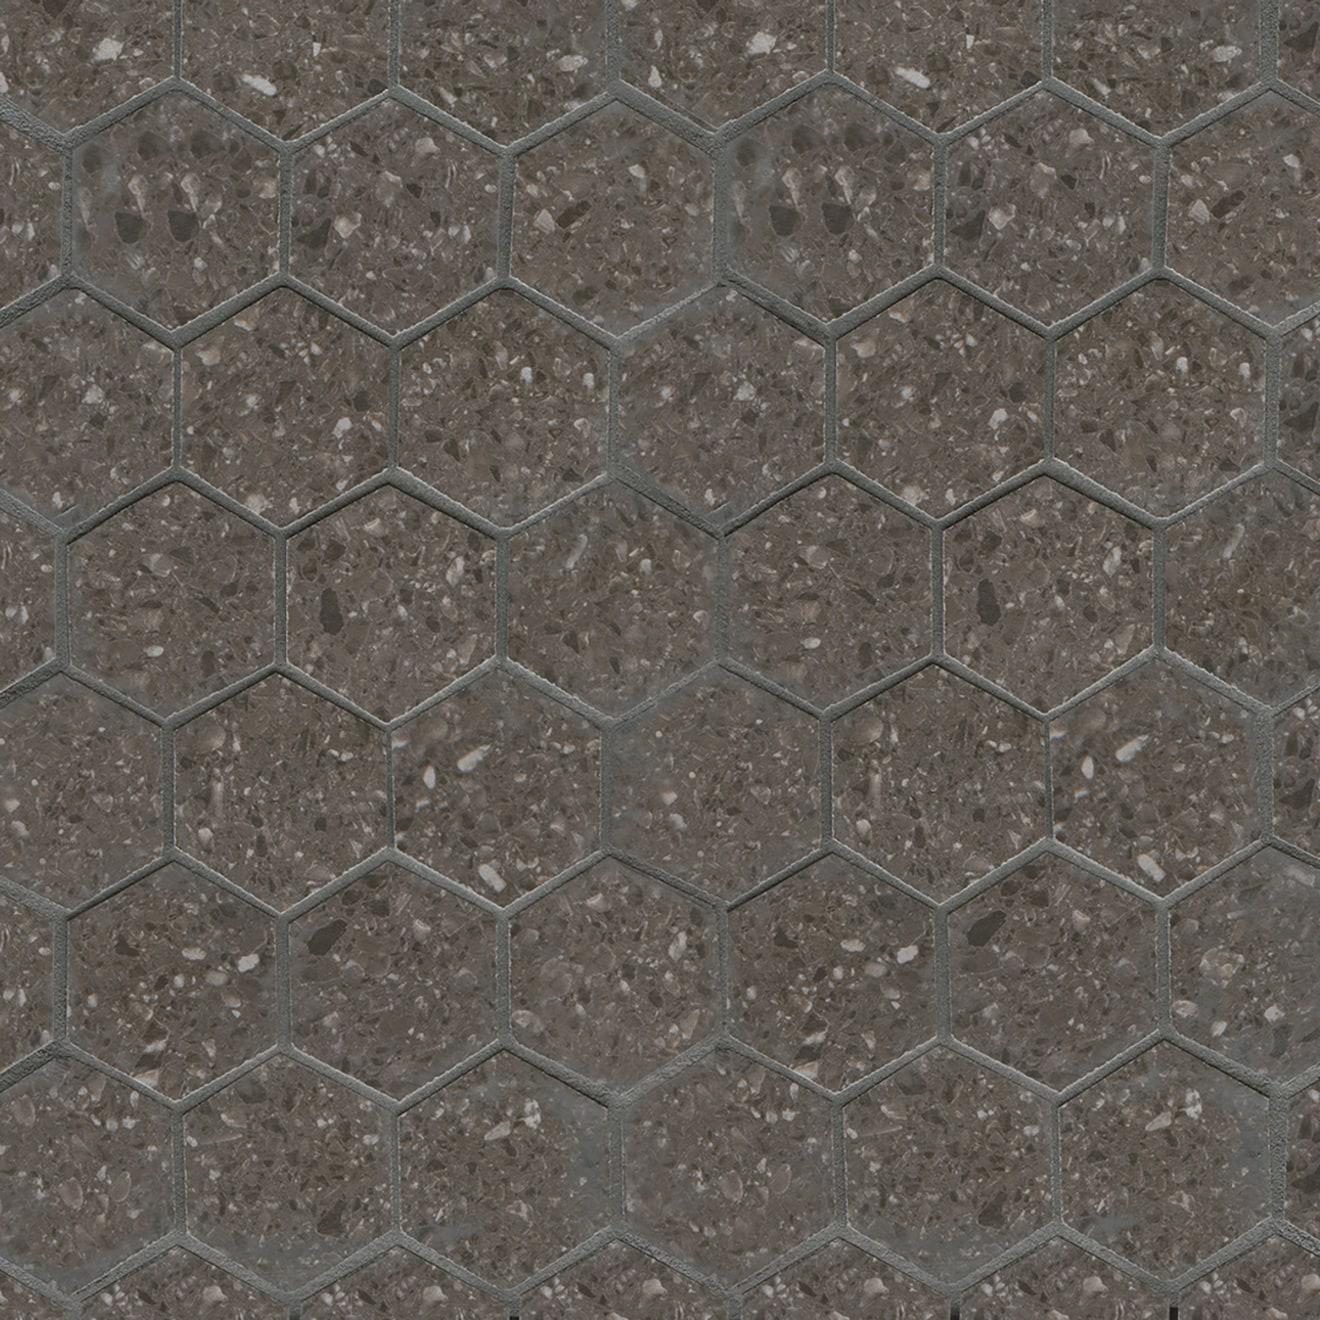 Terrazzo 2 X 2 Floor Wall Mosaic In Dark Gray